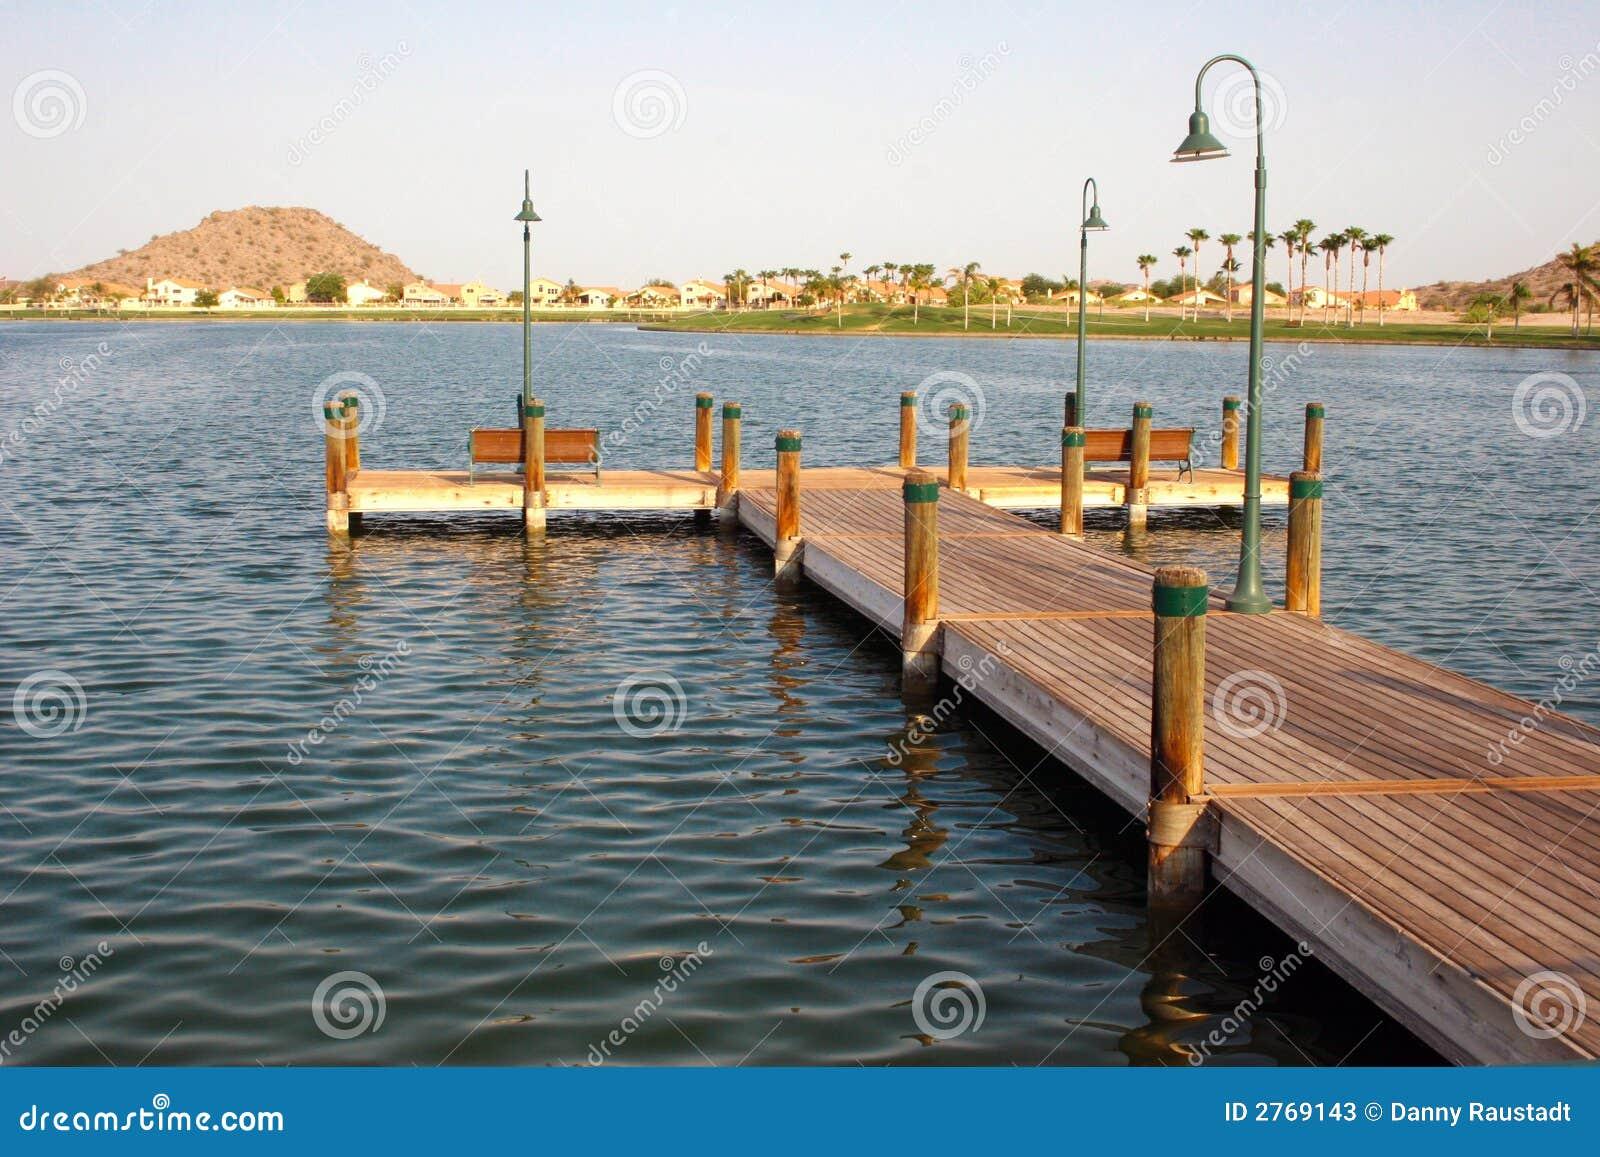 Dock in the arizona desert stock photos image 2769143 for Fishing in phoenix arizona